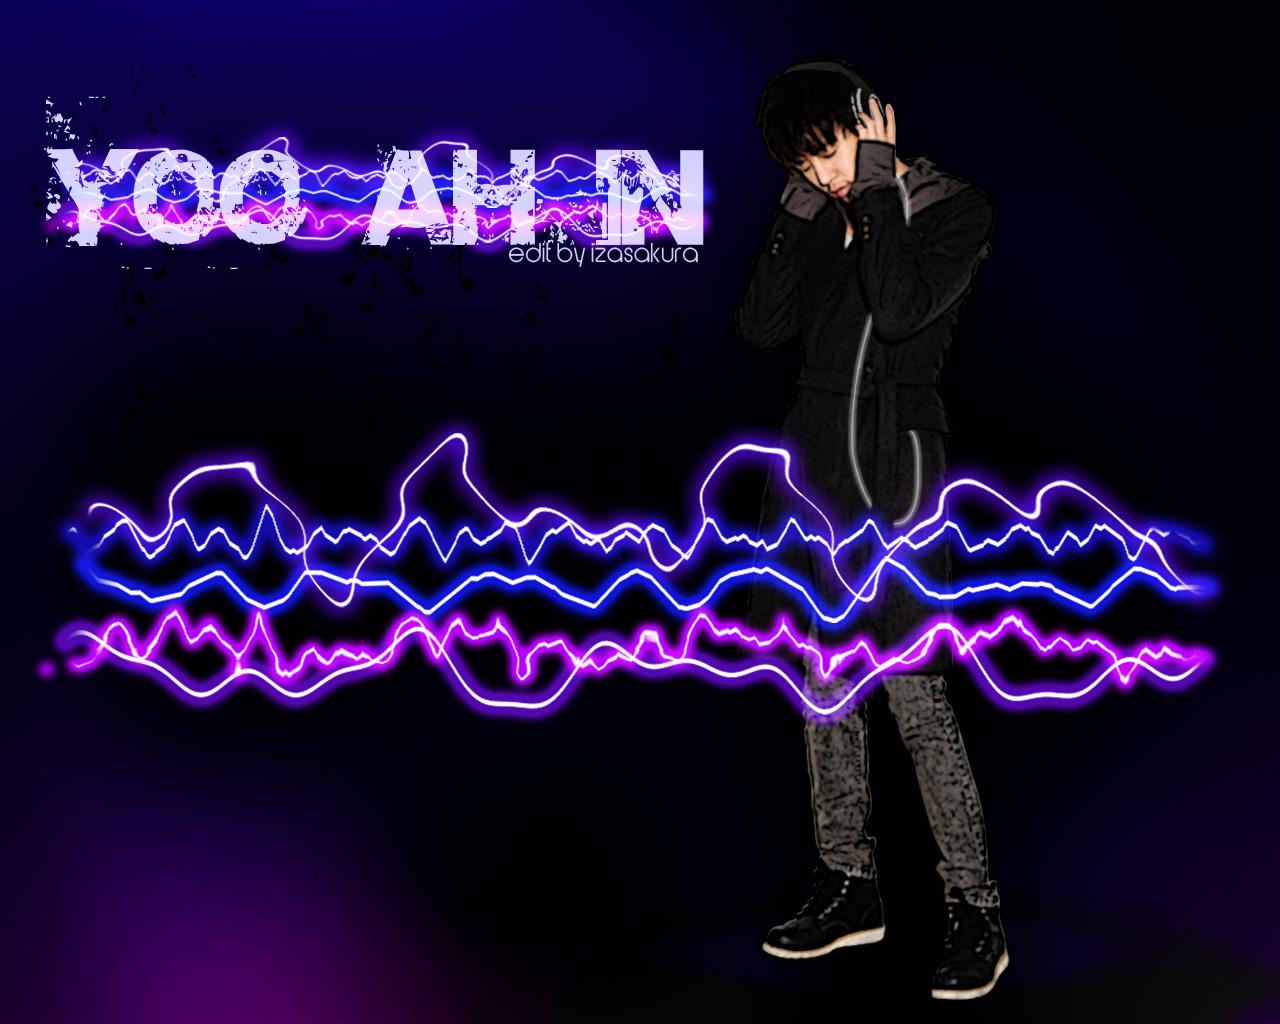 http://4.bp.blogspot.com/_gTbFlbSqgVg/TOLK9yjmU_I/AAAAAAAAAJQ/kgaynmBtVTM/s1600/YAI+audio++stroke+1280x1224.jpg